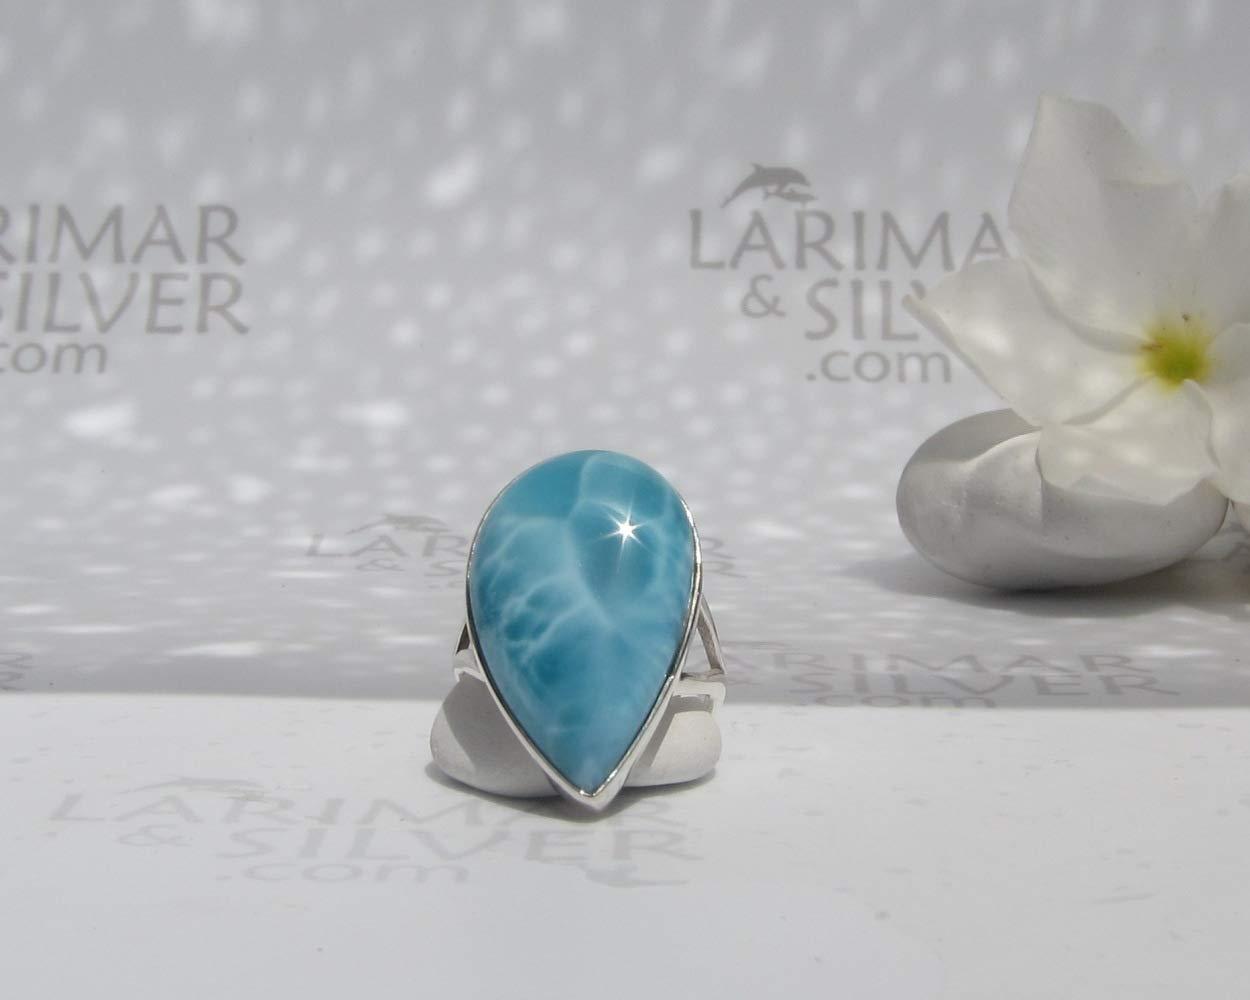 Larimar ring size 7.5 by Larimarandsilver Larimar ring 925 silverblue topaz ringwater dropLarimar jewelrybest gift woman C\u00f4te d\u2019Azure